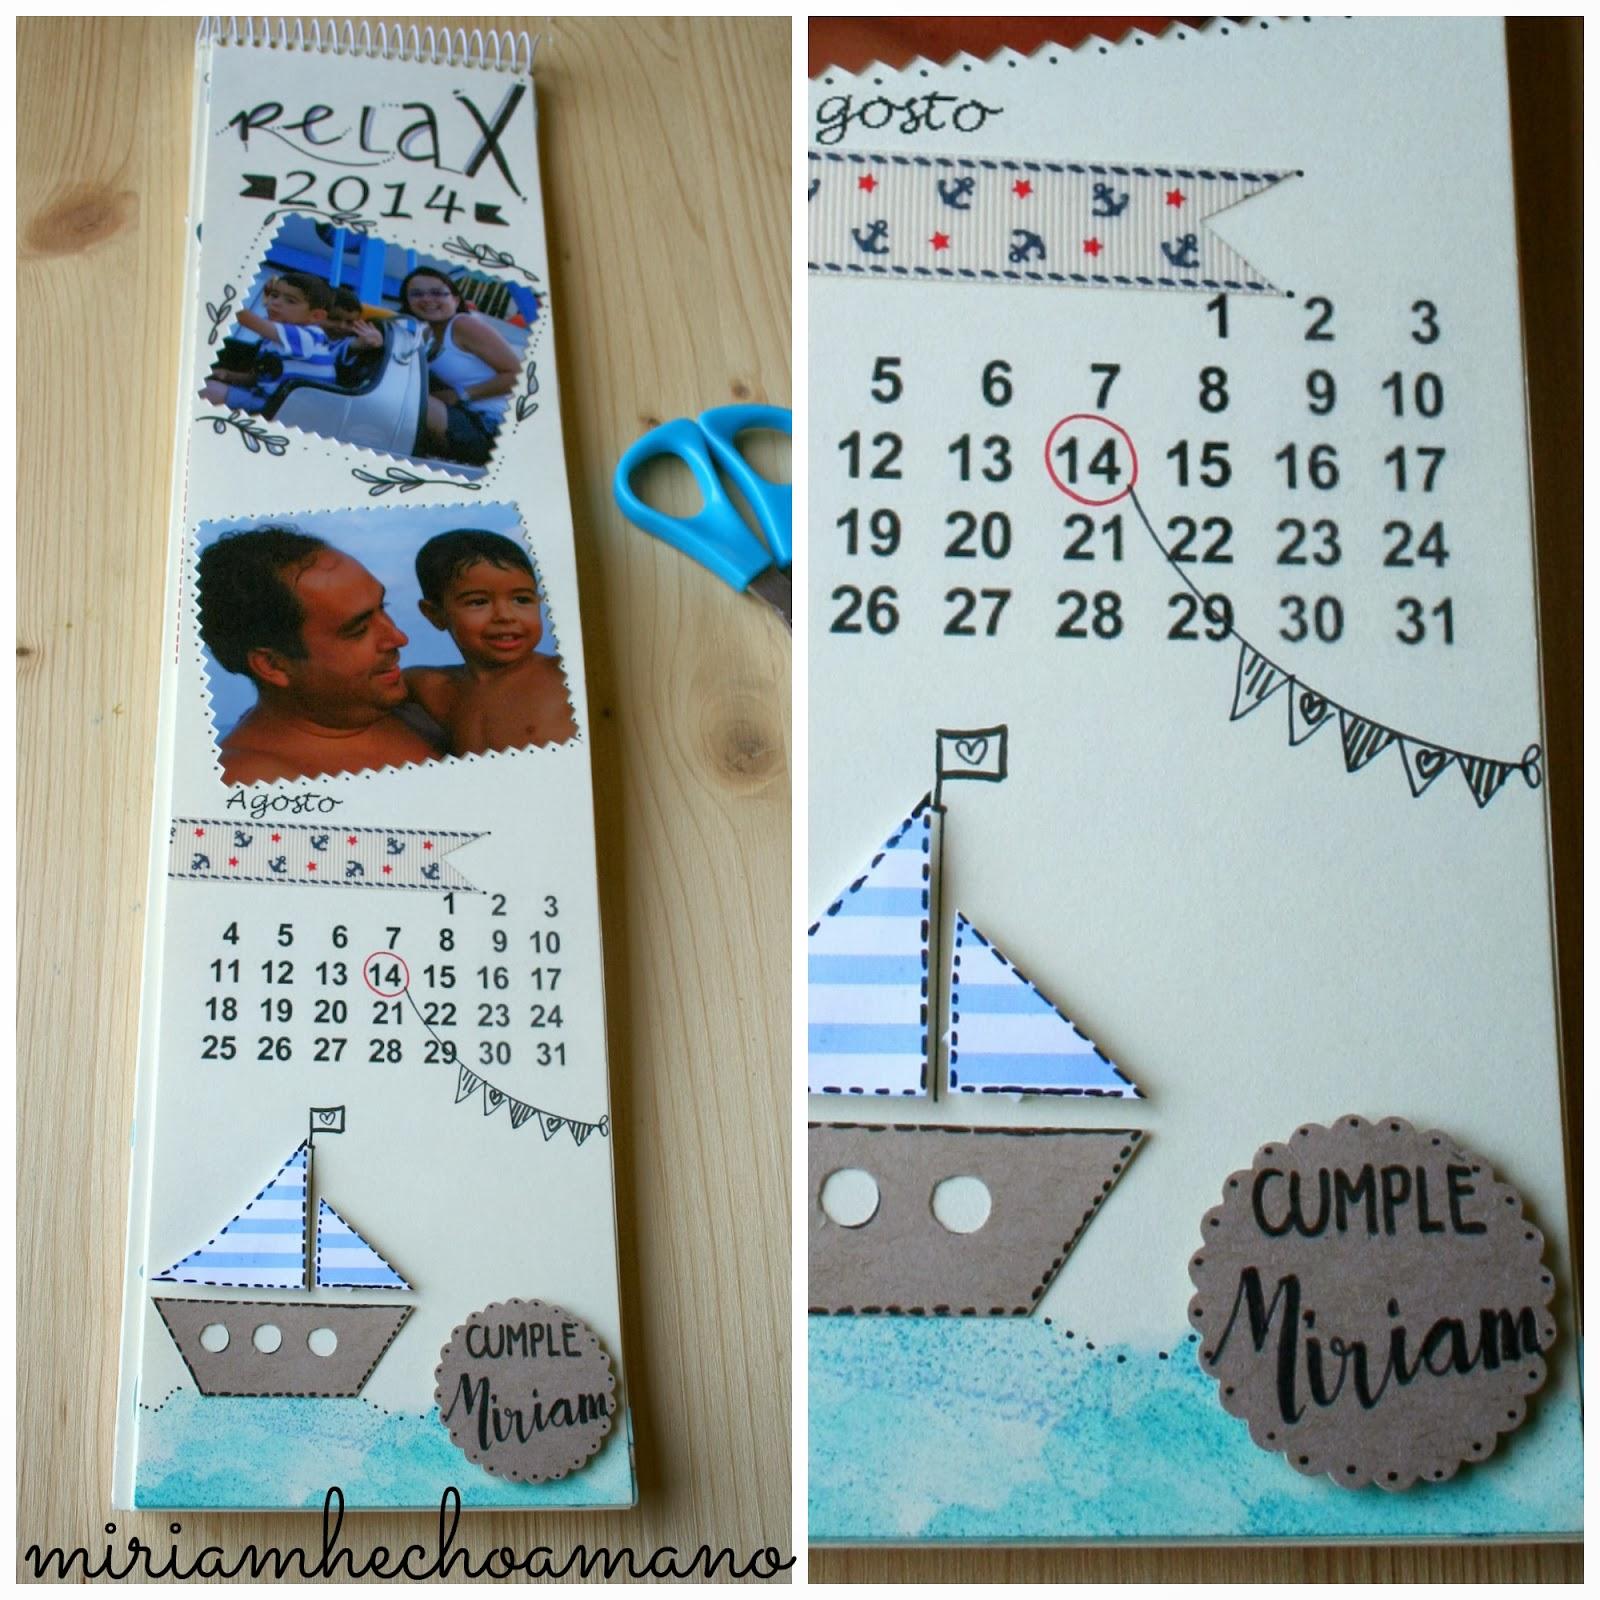 Miriam hecho a mano calendario del 2014 hecho a mano - Calendarios navidenos personalizados ...